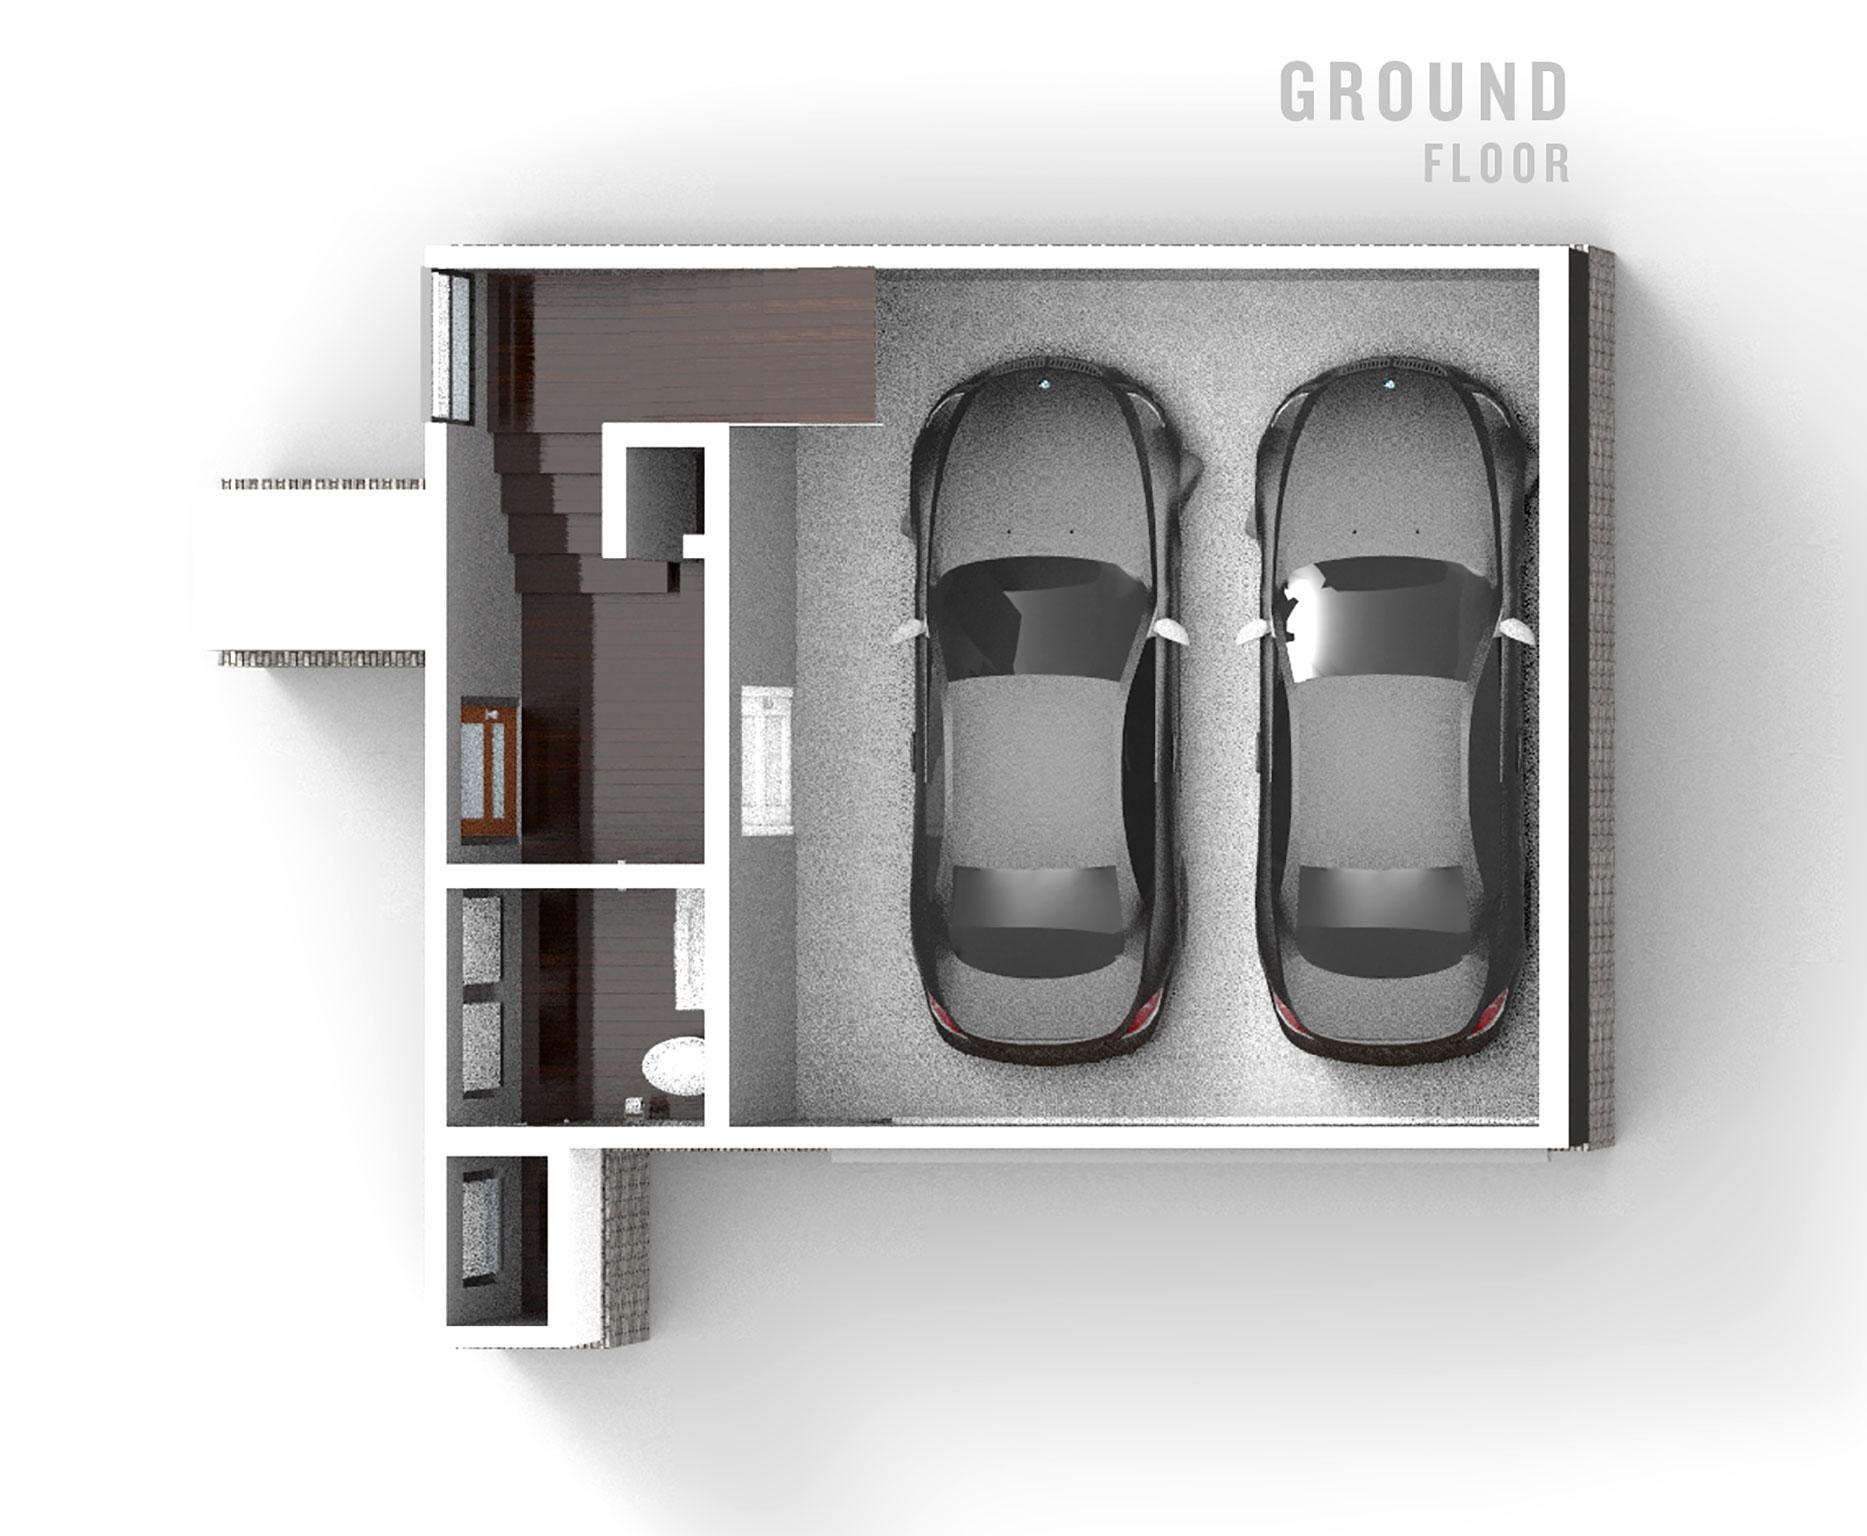 Thomas Greiman - 1254-Perry-Unit-1-GroundFloor copy